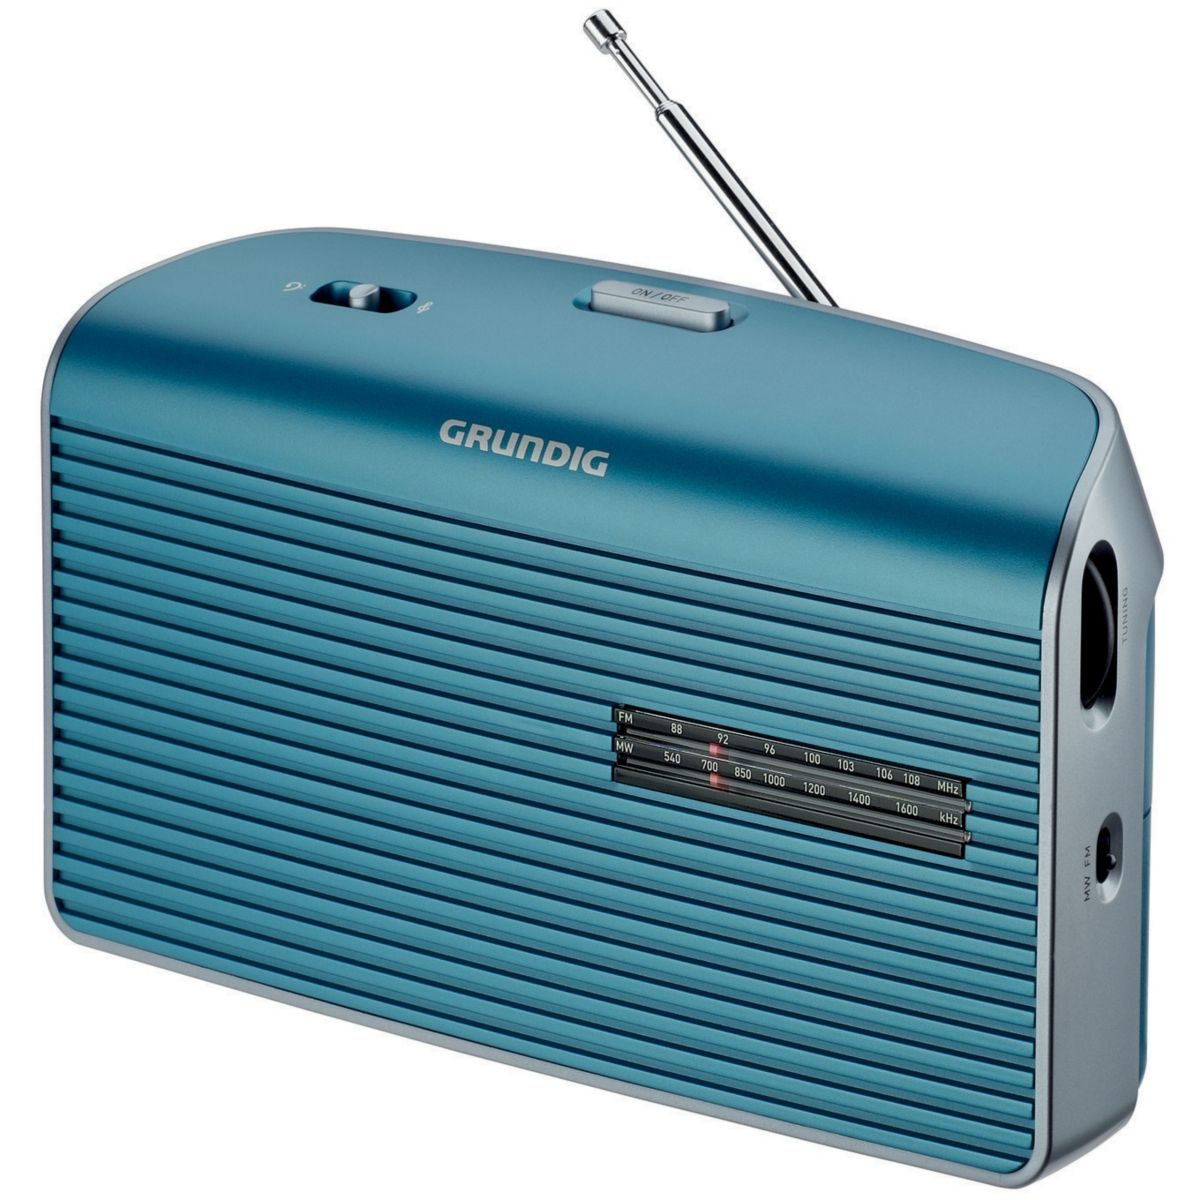 Radio grundig music 60 l turquoise - livraison offerte : code liv (photo)